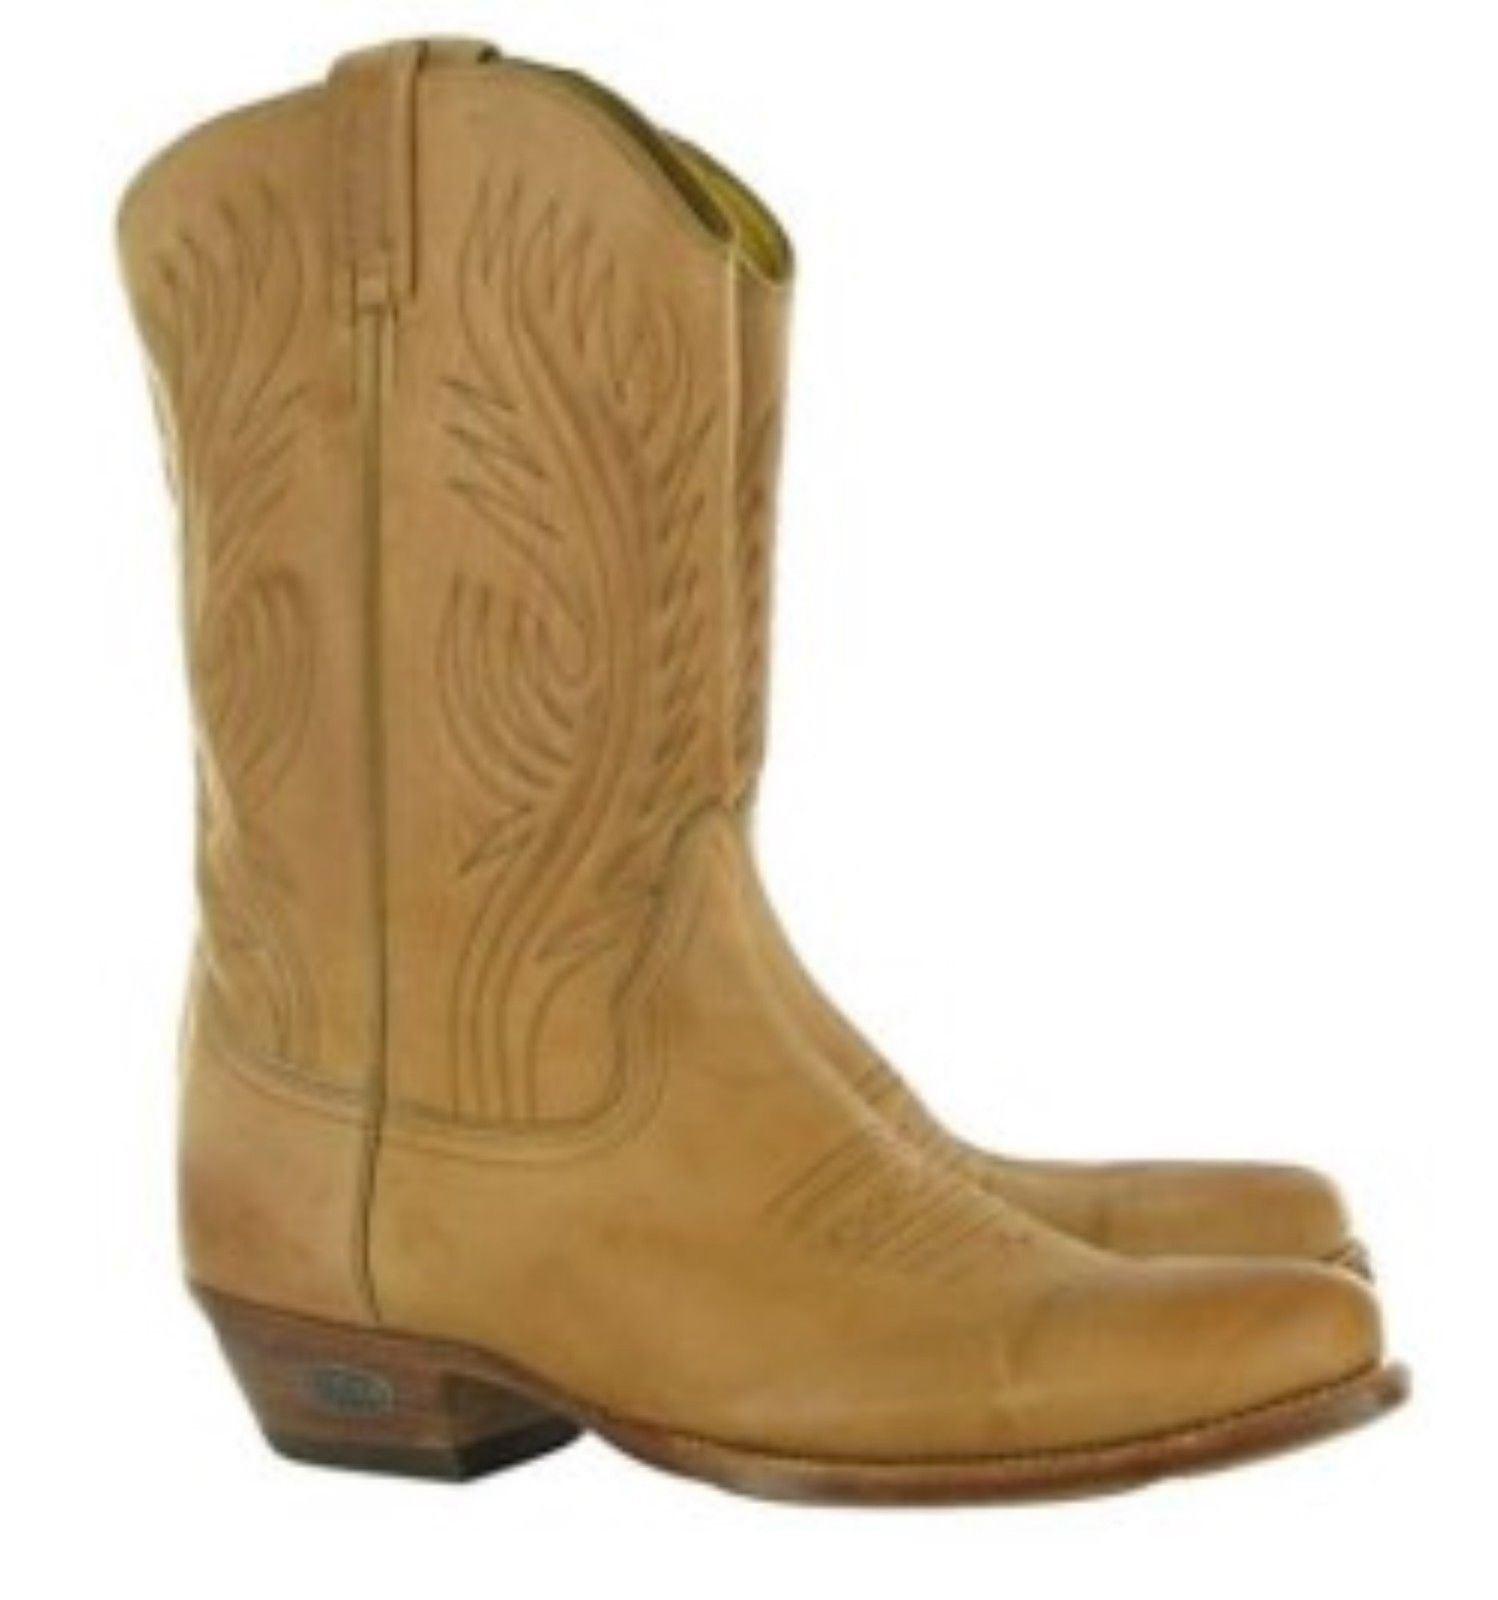 Loblan 194 Tan Beige Leather Cowboy Stiefel Handmade Classic herren Western Stiefel